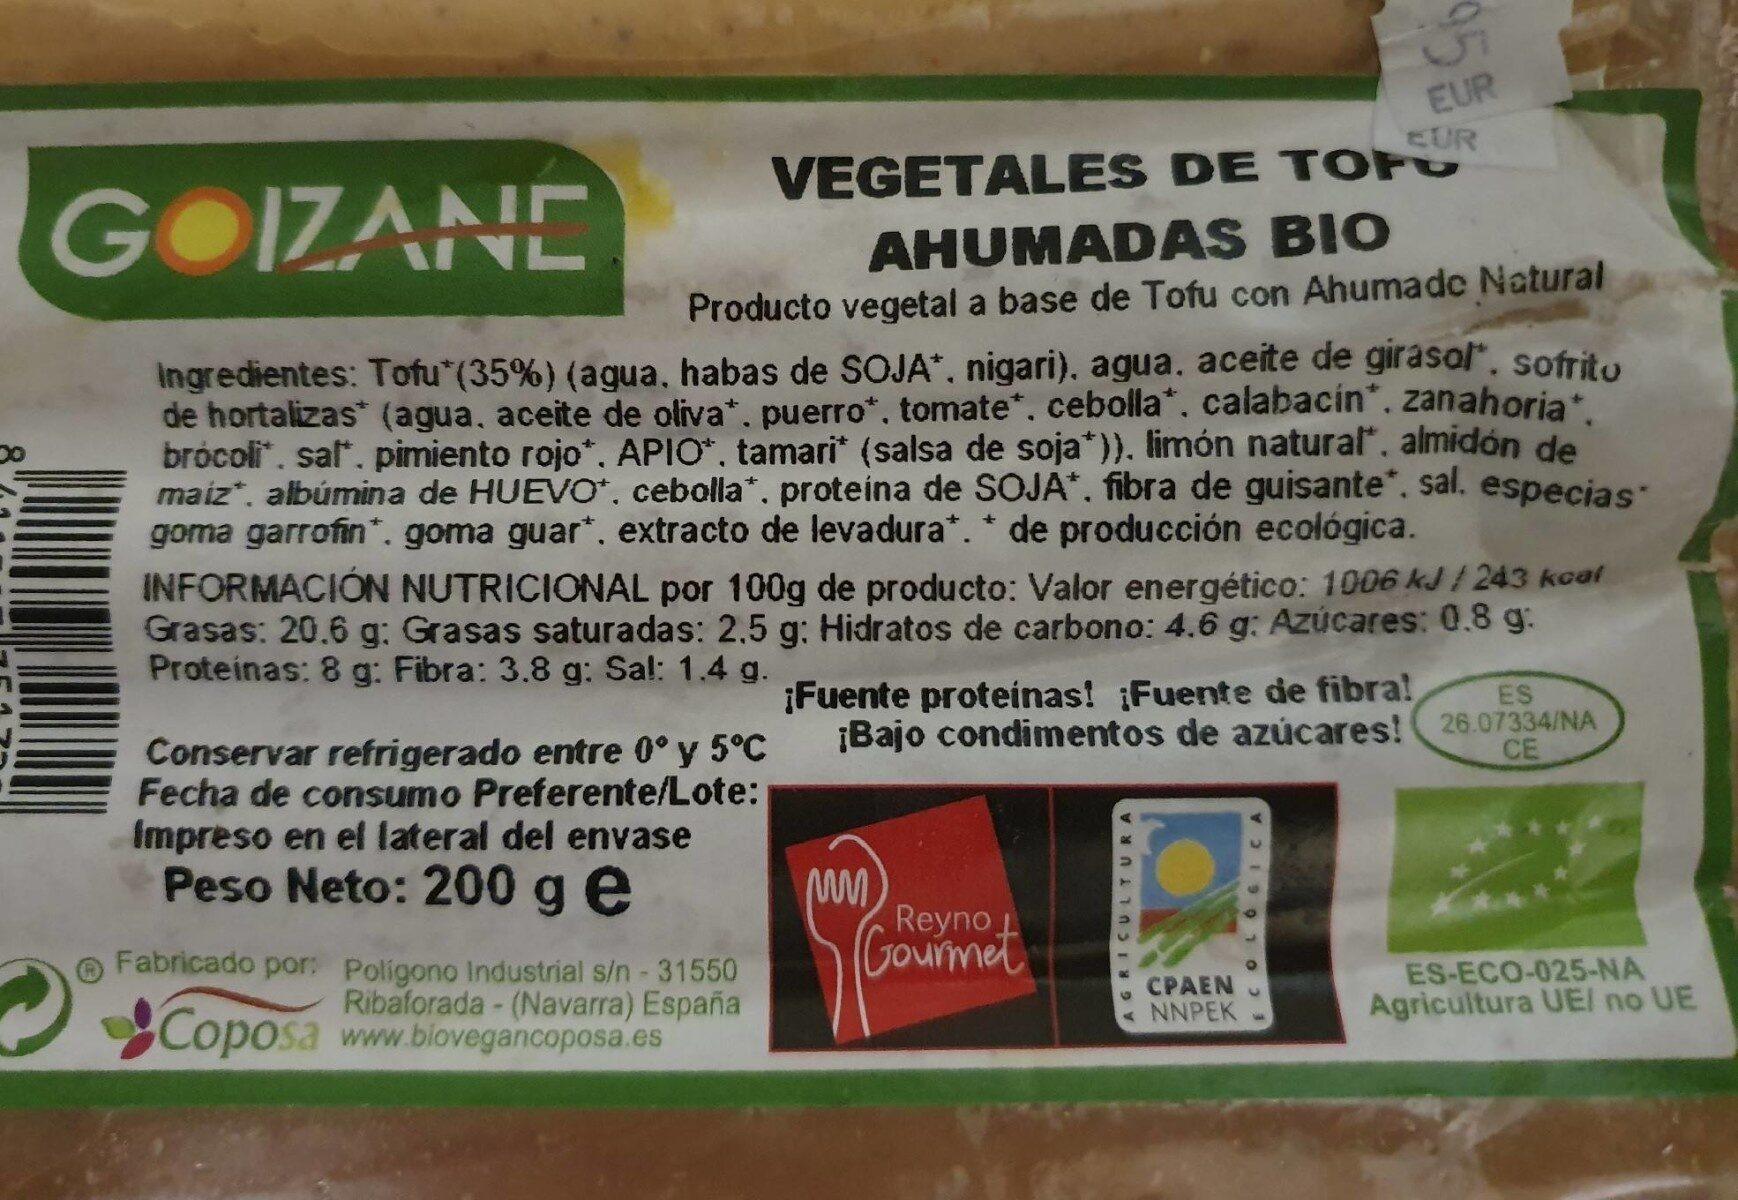 Vegetales de tofu ahumadas bio - Product - es